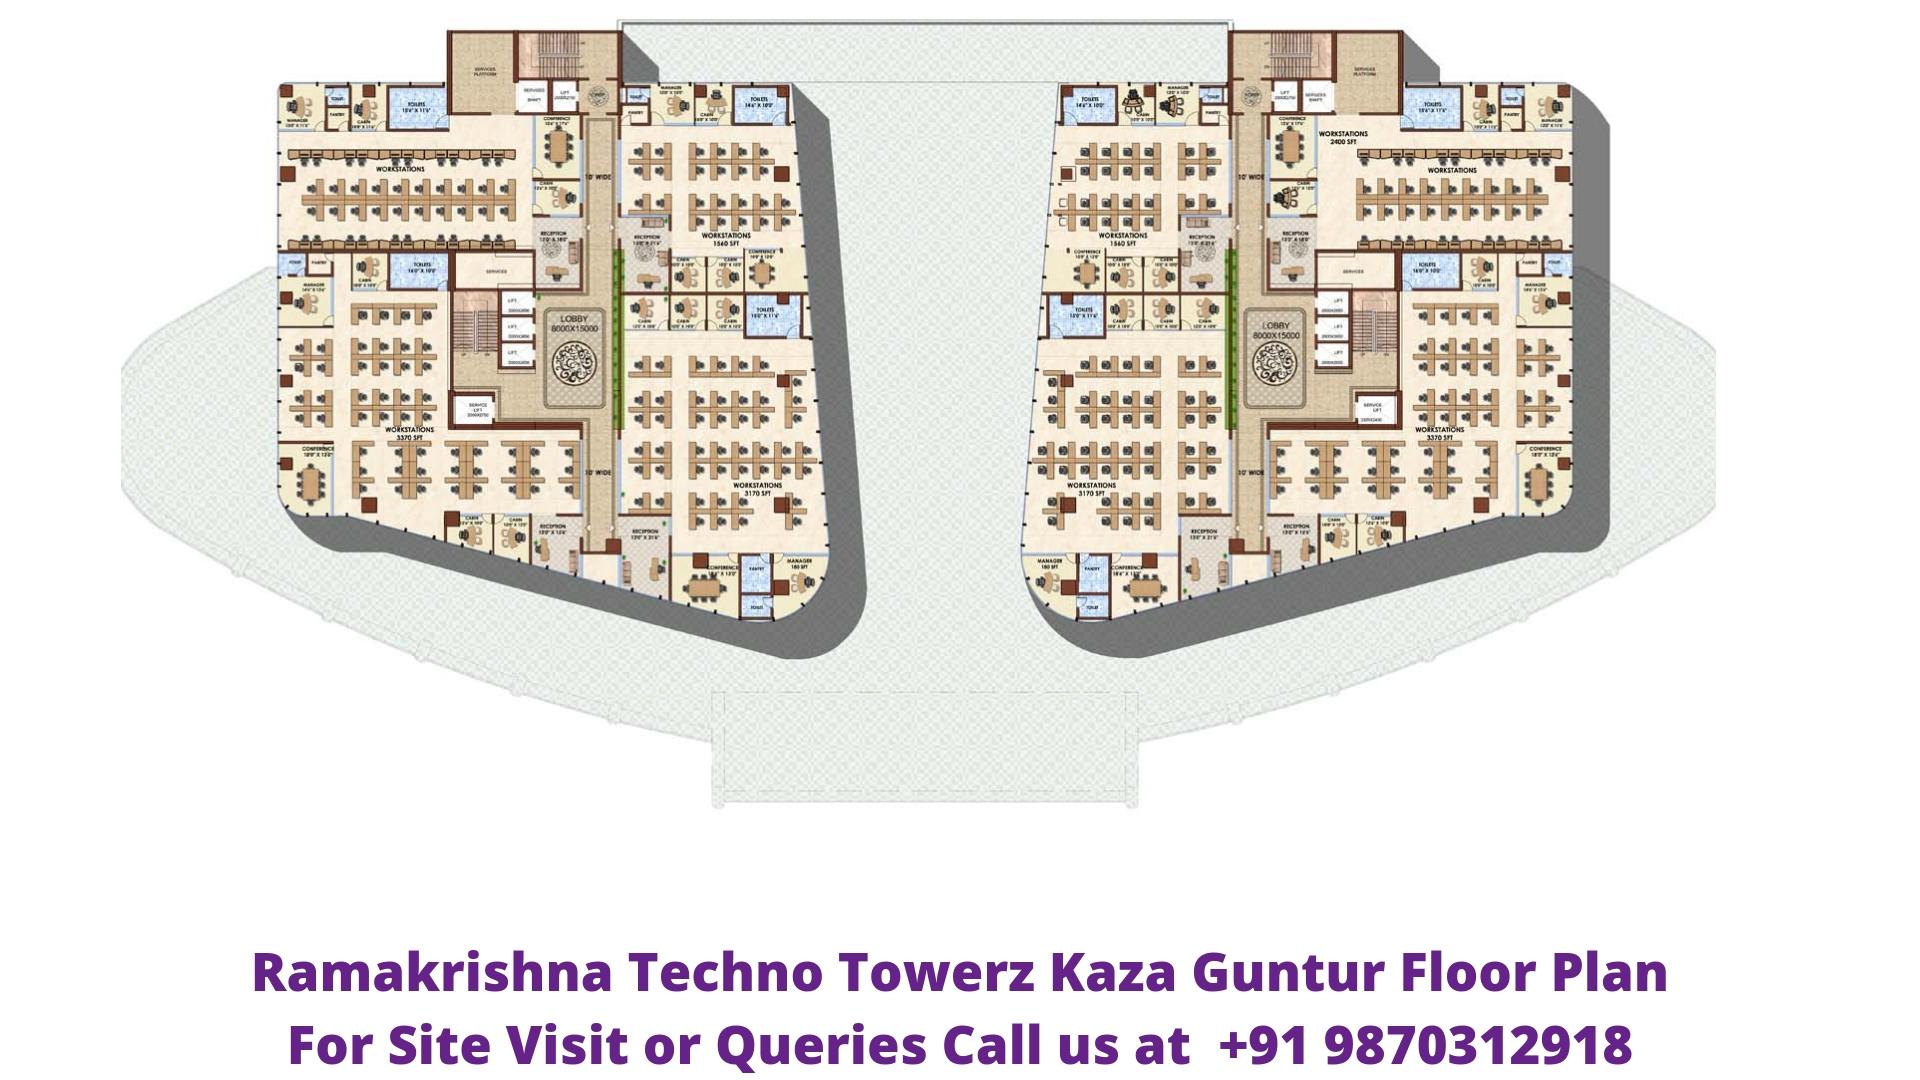 Ramakrishna Techno Towerz Kaza Guntur